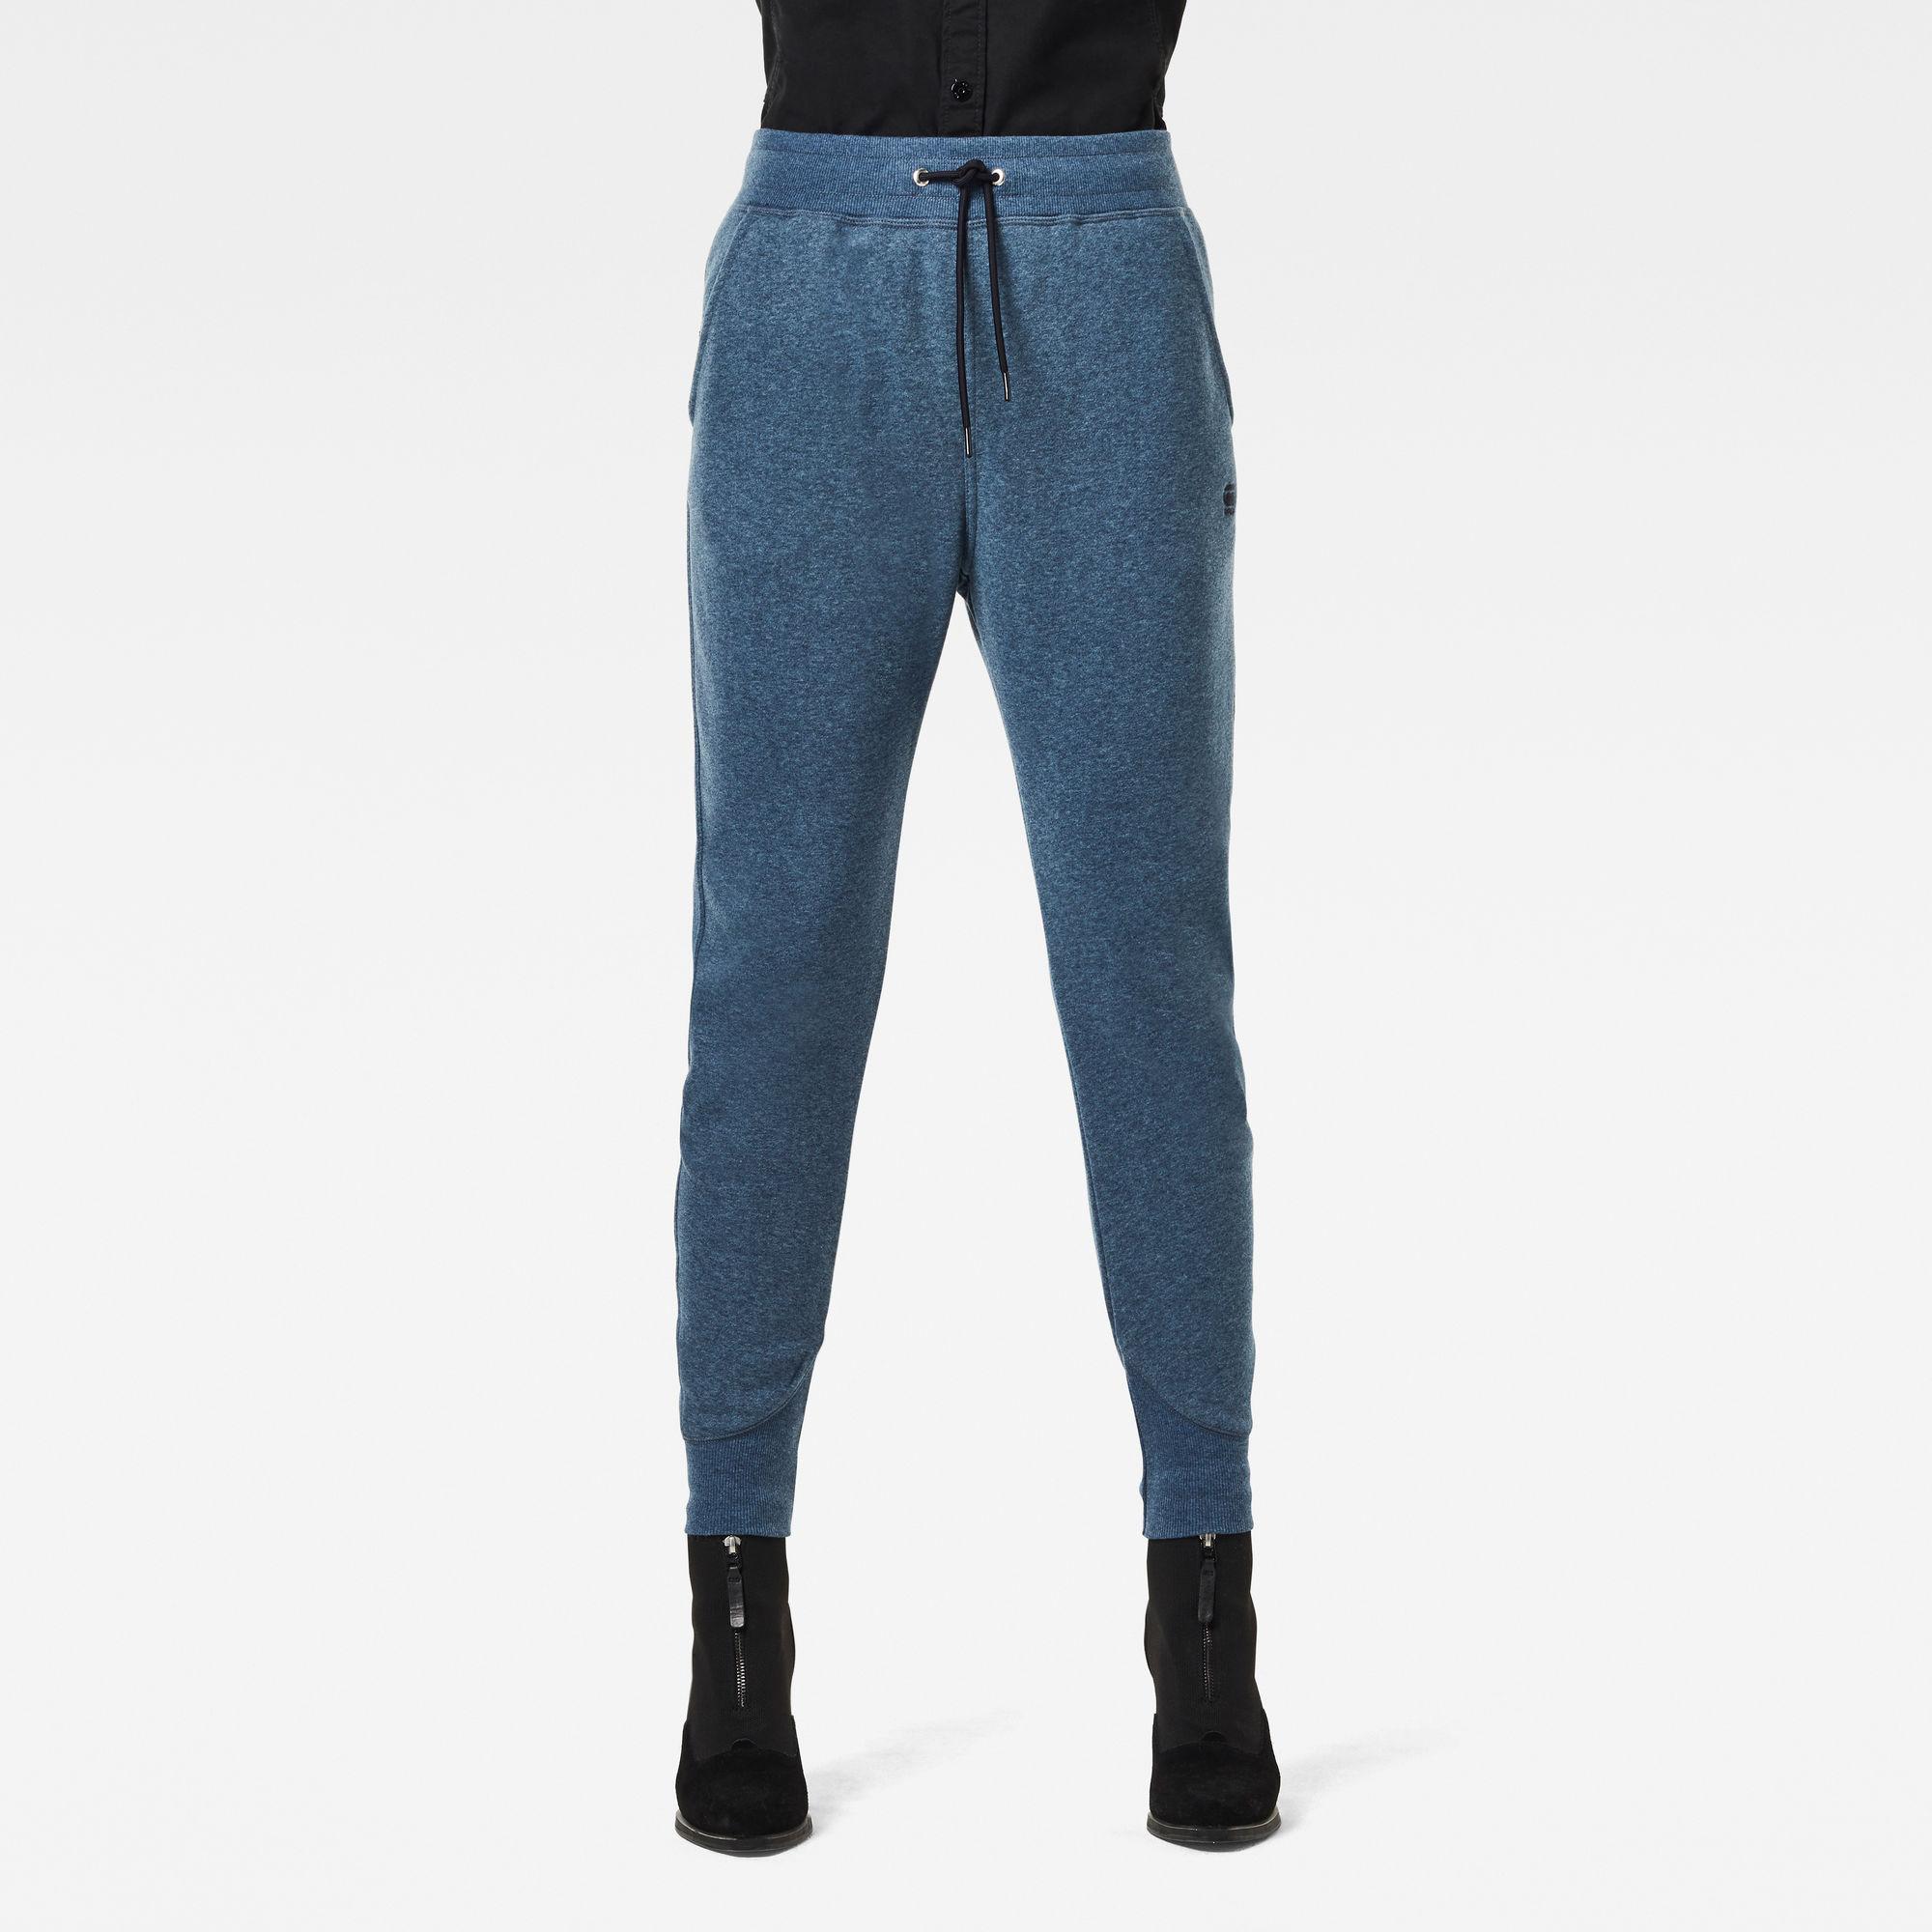 G-Star RAW Dames Premium Core 3D Tapered Sweatpants Blauw